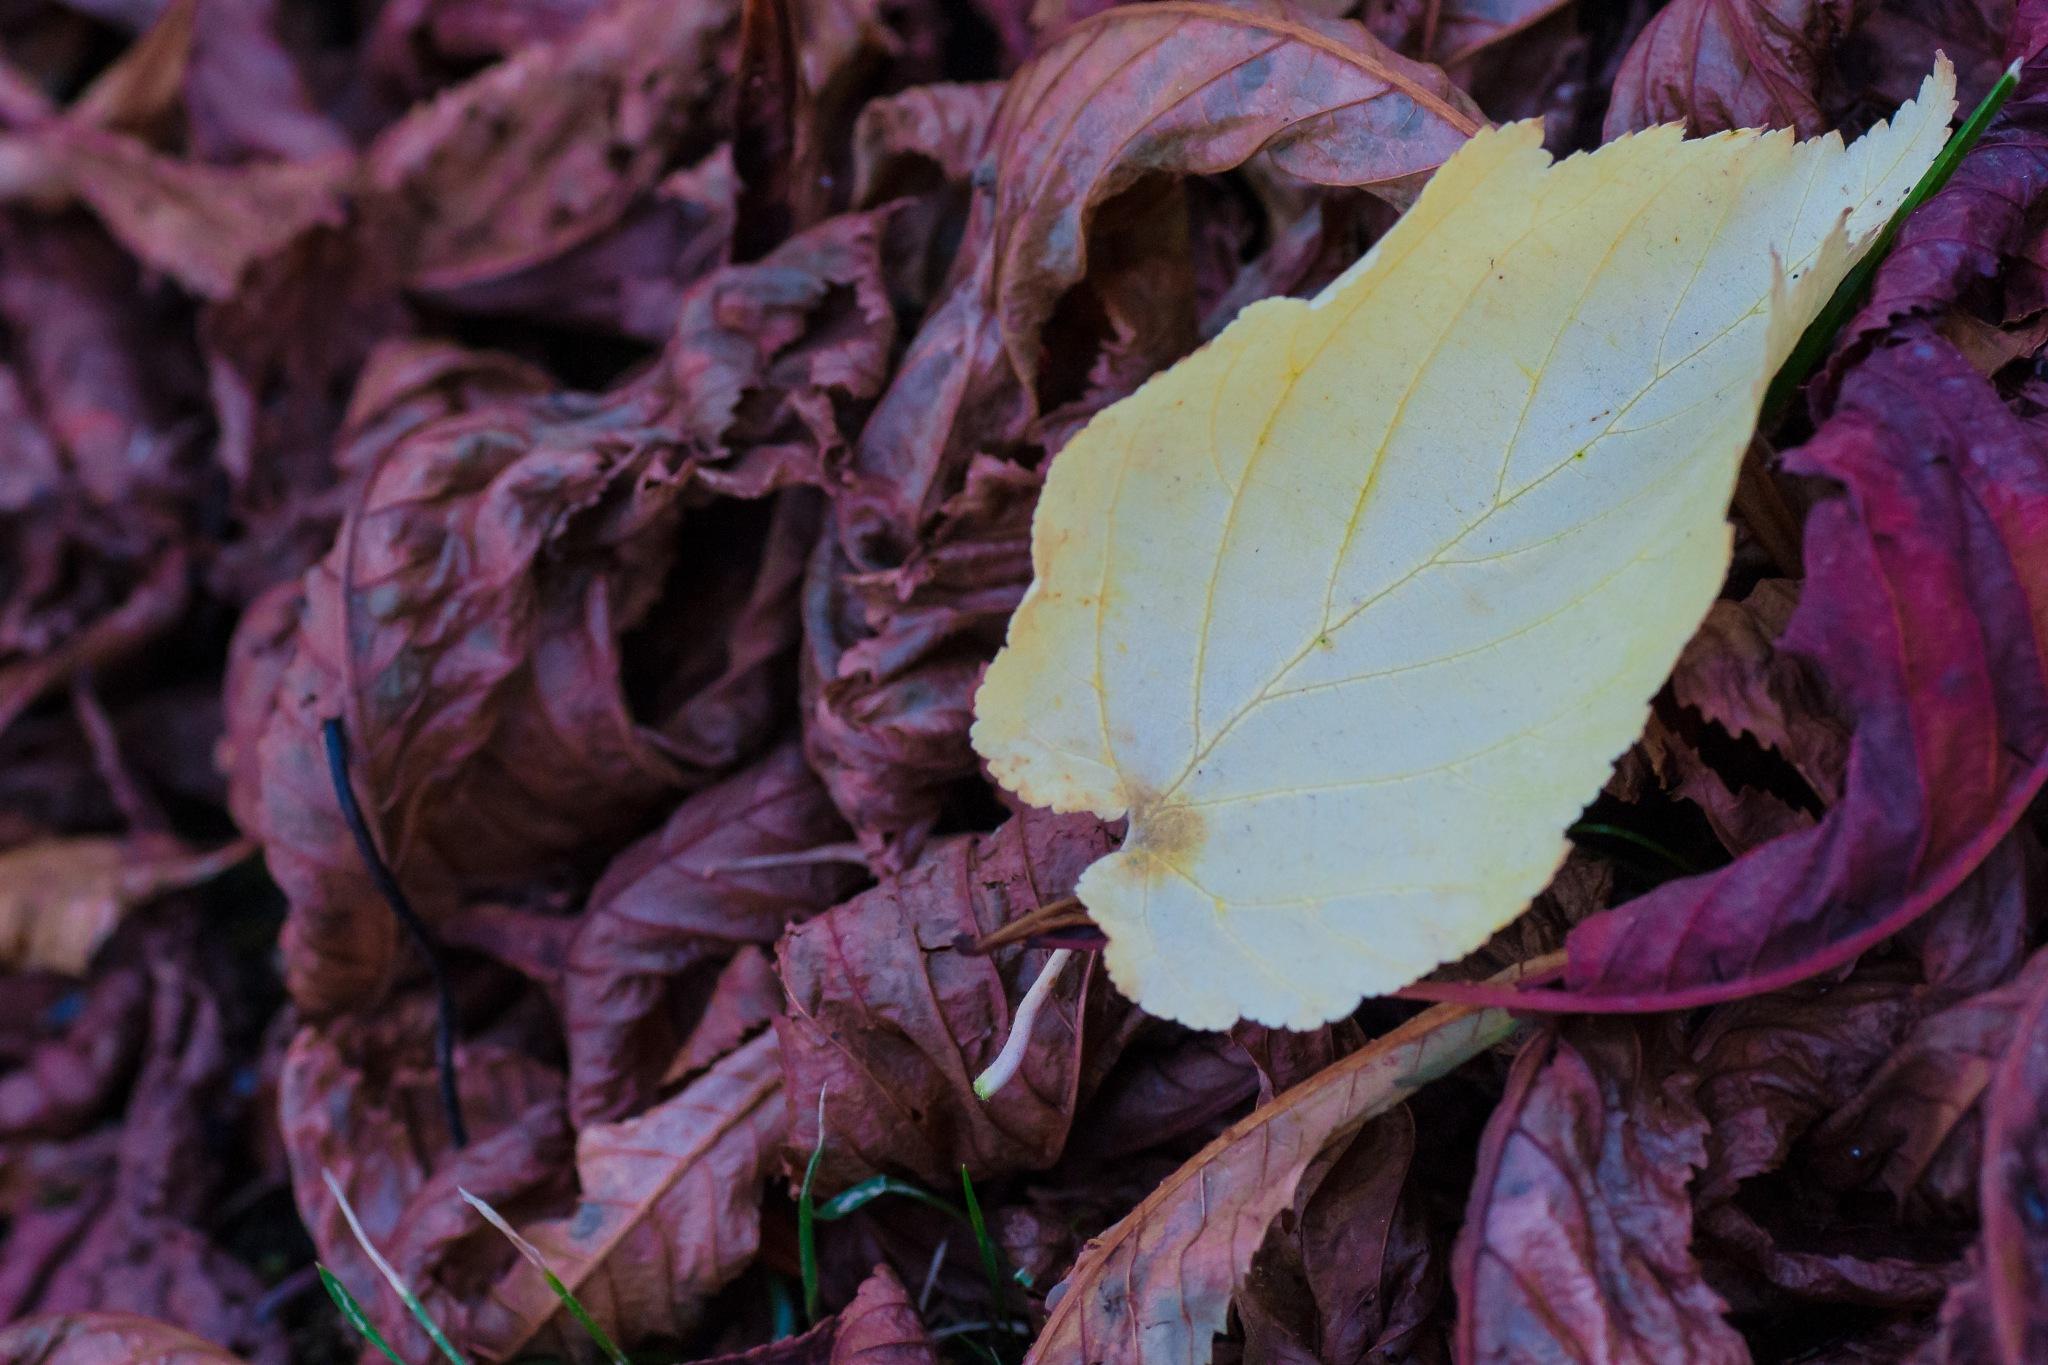 The yellow leaf by Hervé Samson